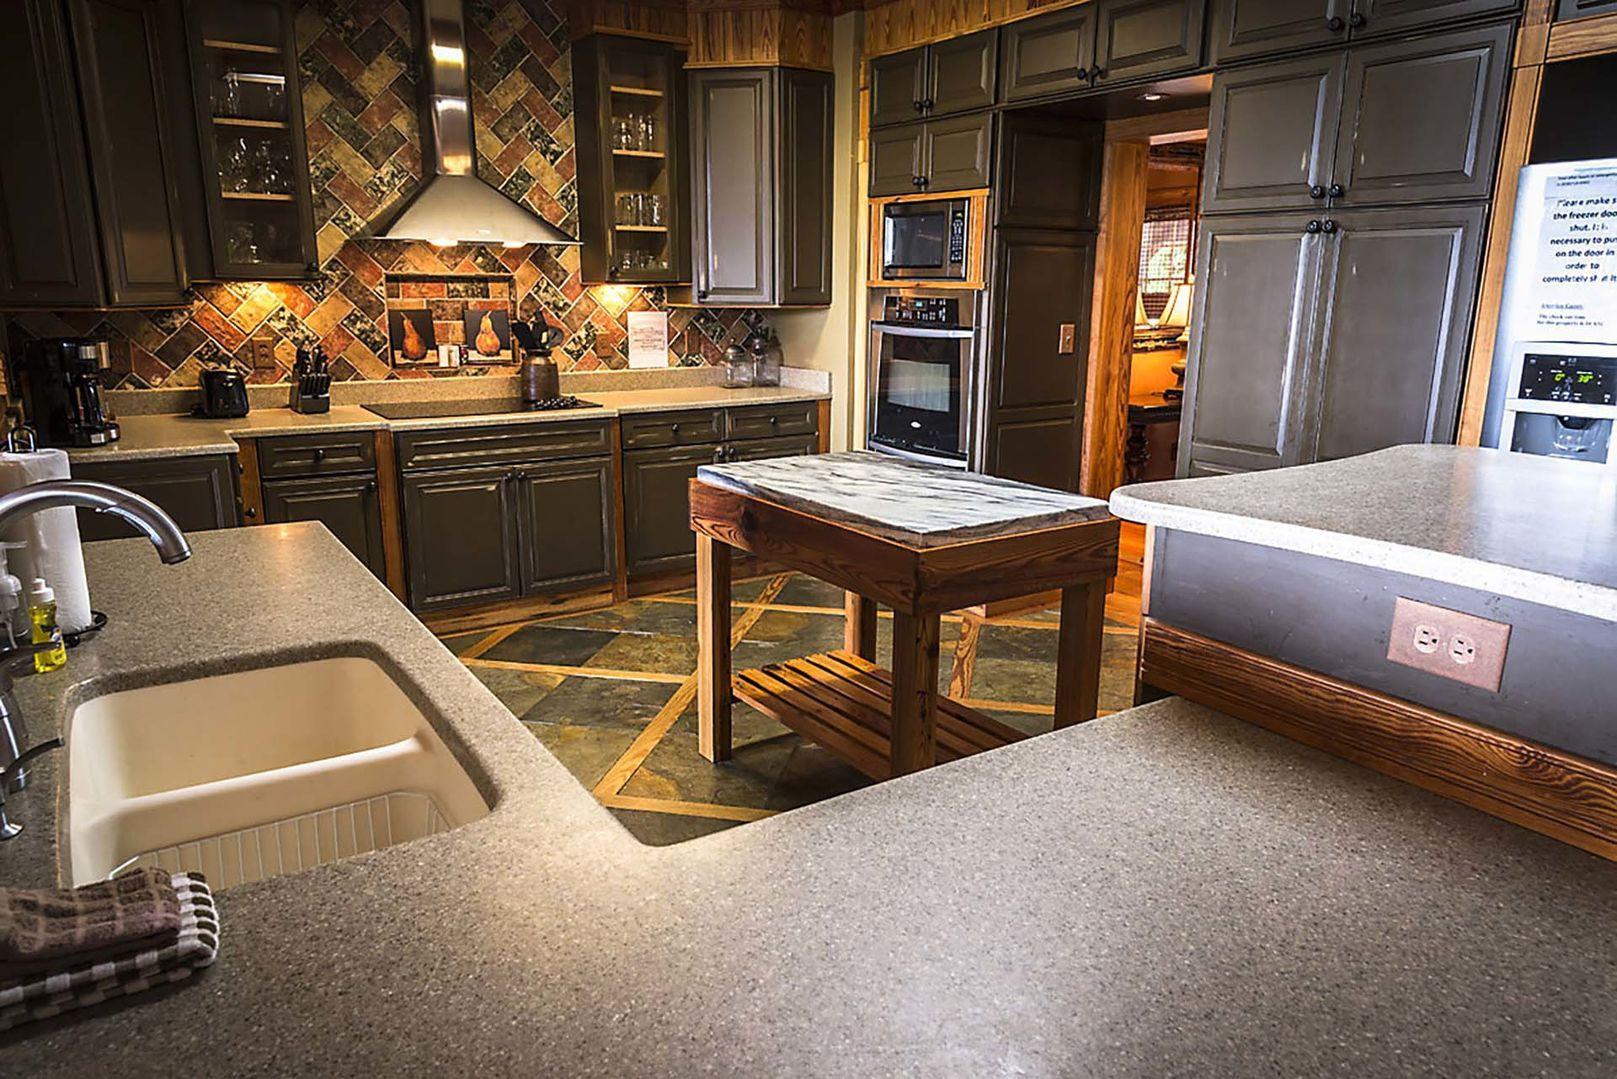 Stonewood Hardwood Flooring Reviews Of Property Info Blue Ridge Mountain Rentals Inside Back to top